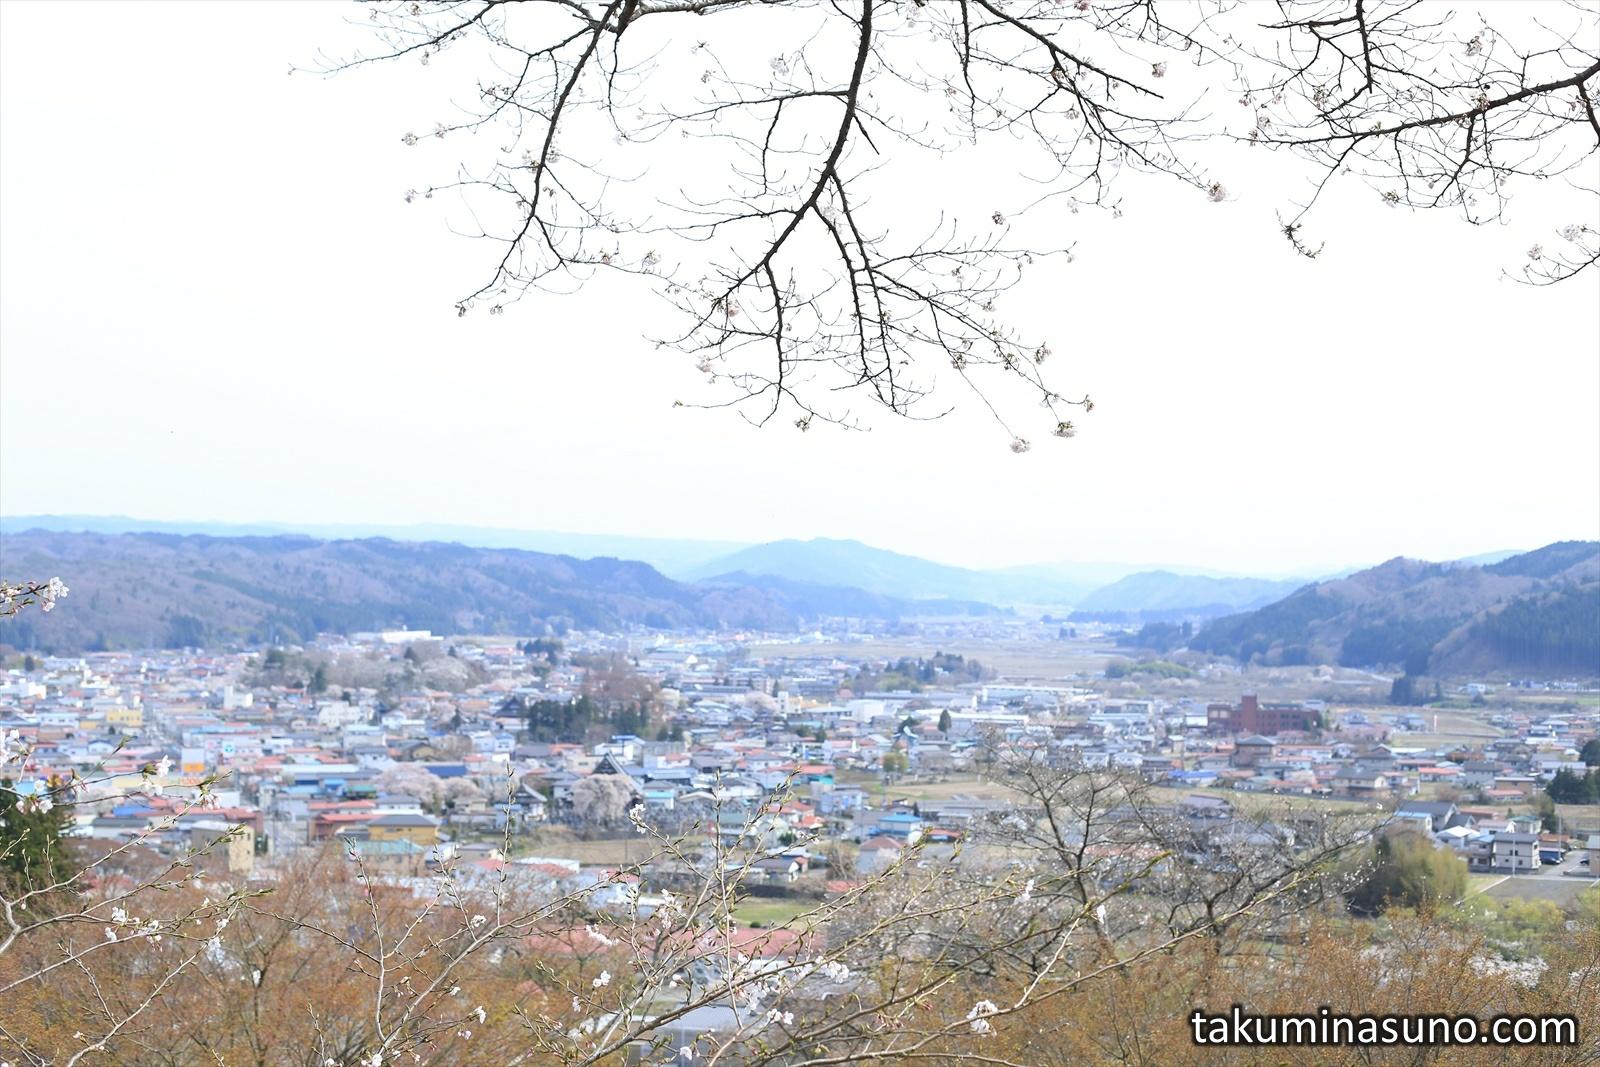 View of Tanagura Town from Akadate Park